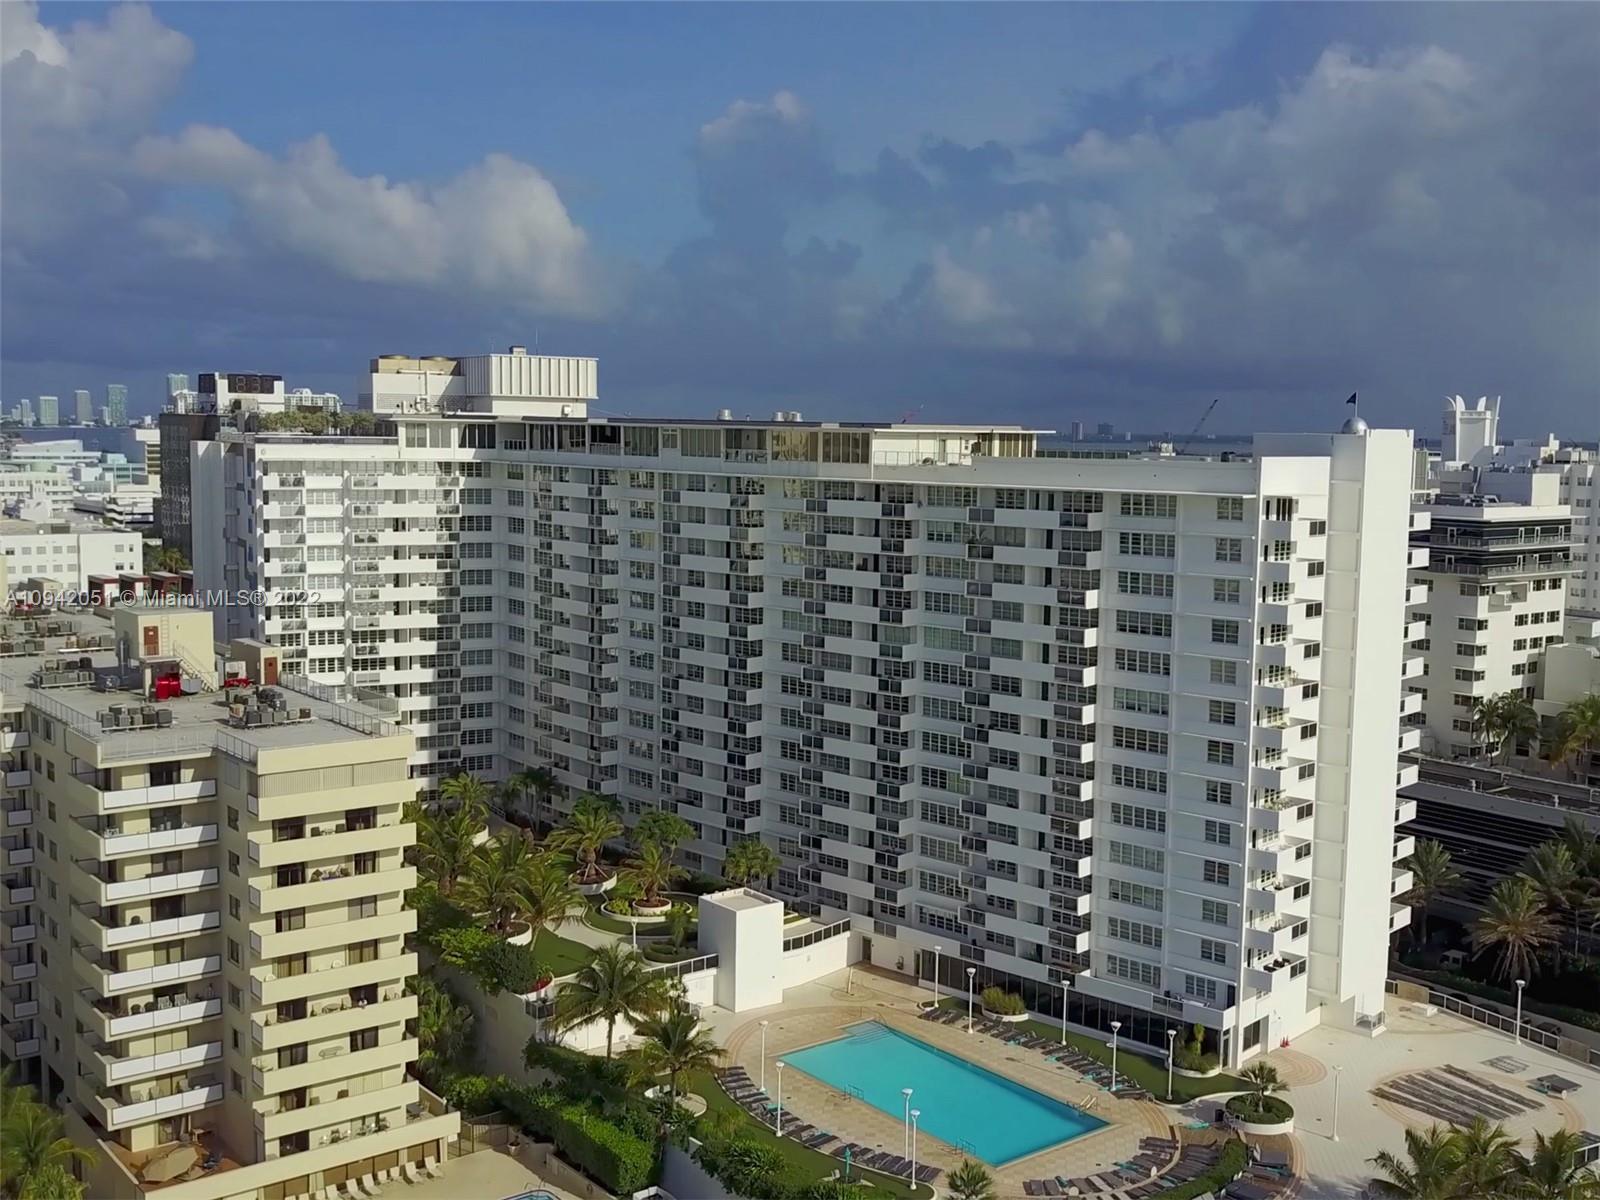 Decoplage #716 - 100 Lincoln Rd #716, Miami Beach, FL 33139